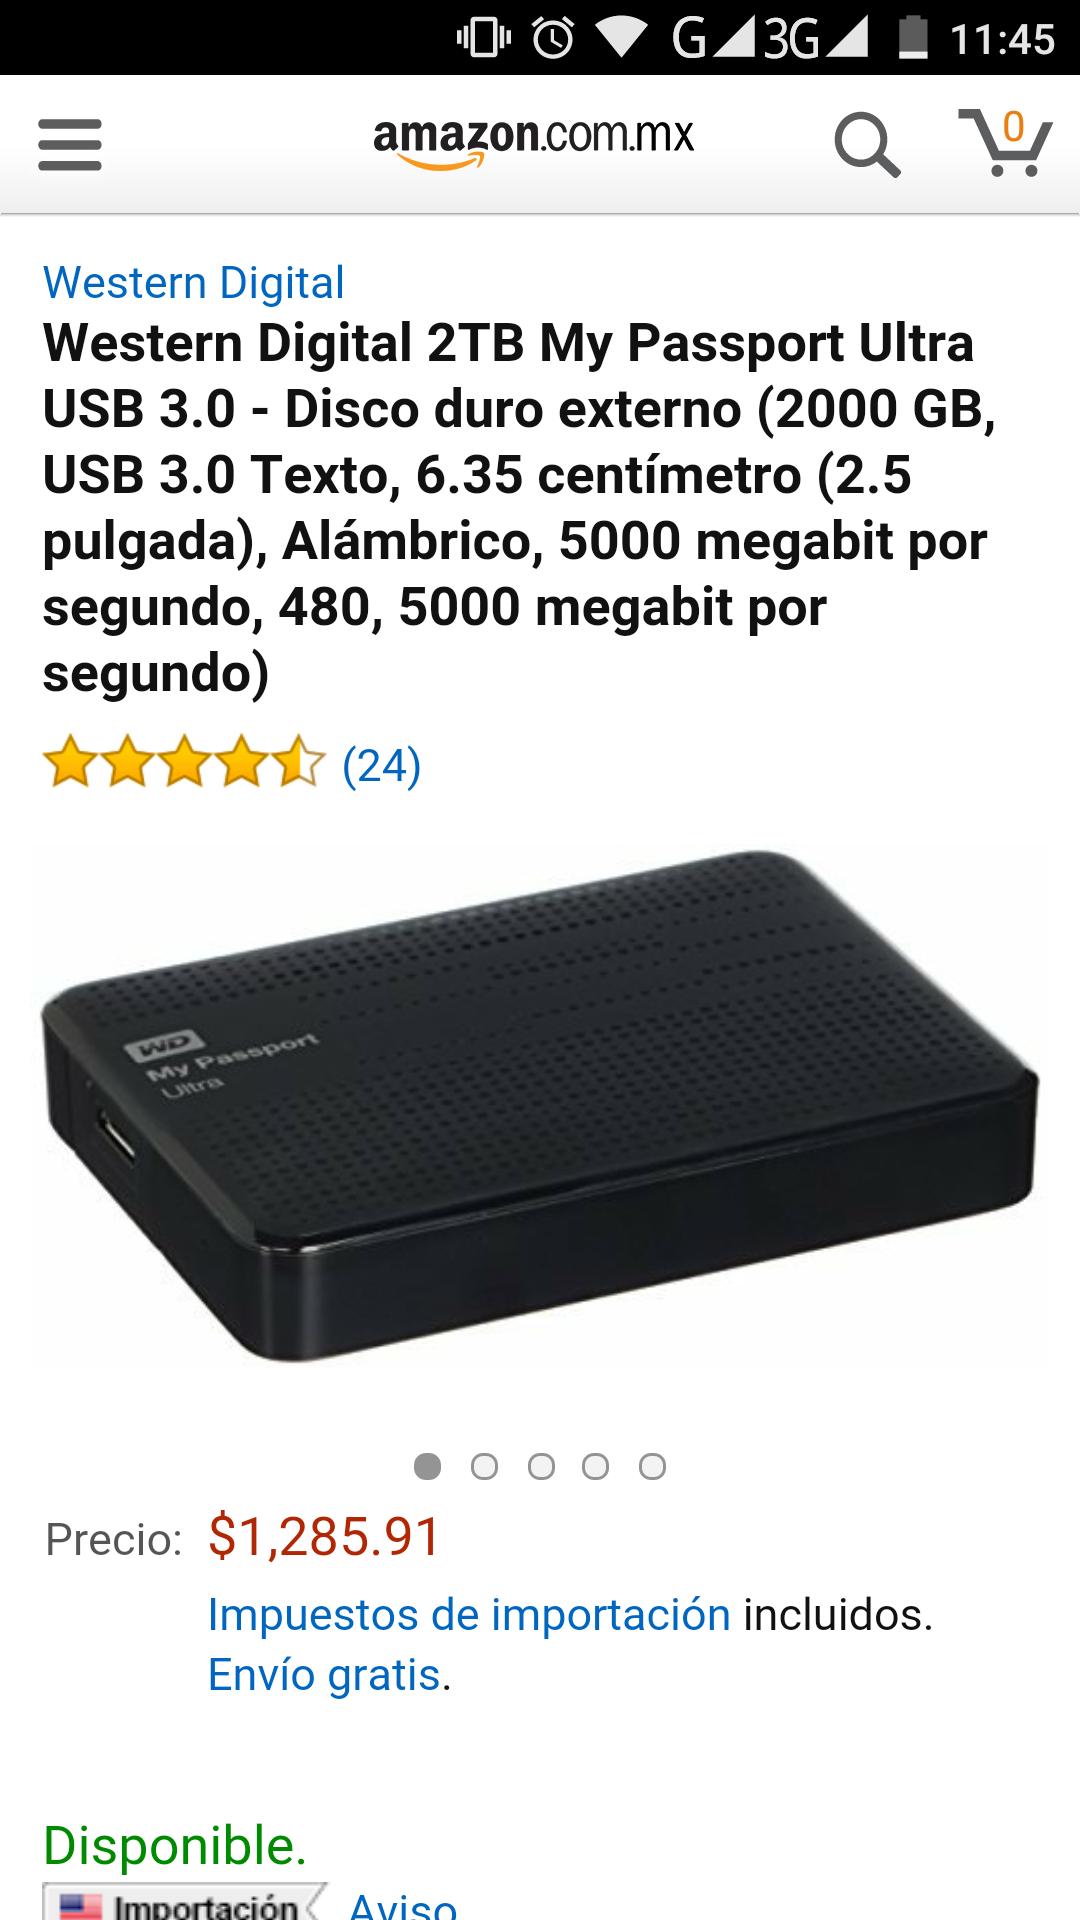 Amazon: disco duro western digital 2tb my passport ultra USB 3.0